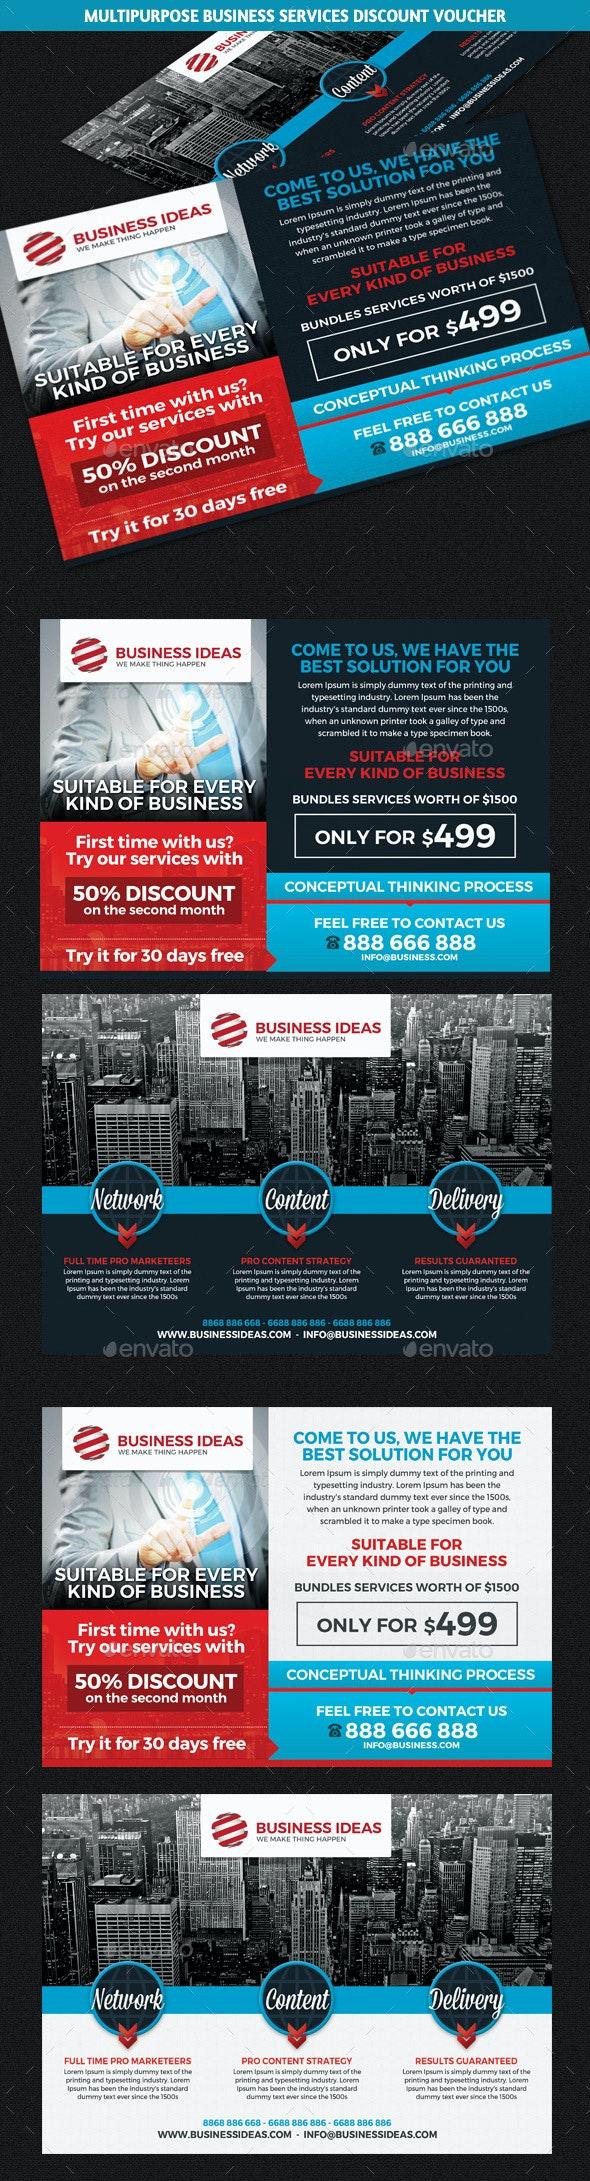 Multipurpose Business Discount Voucher Template - Cards & Invites Print Templates